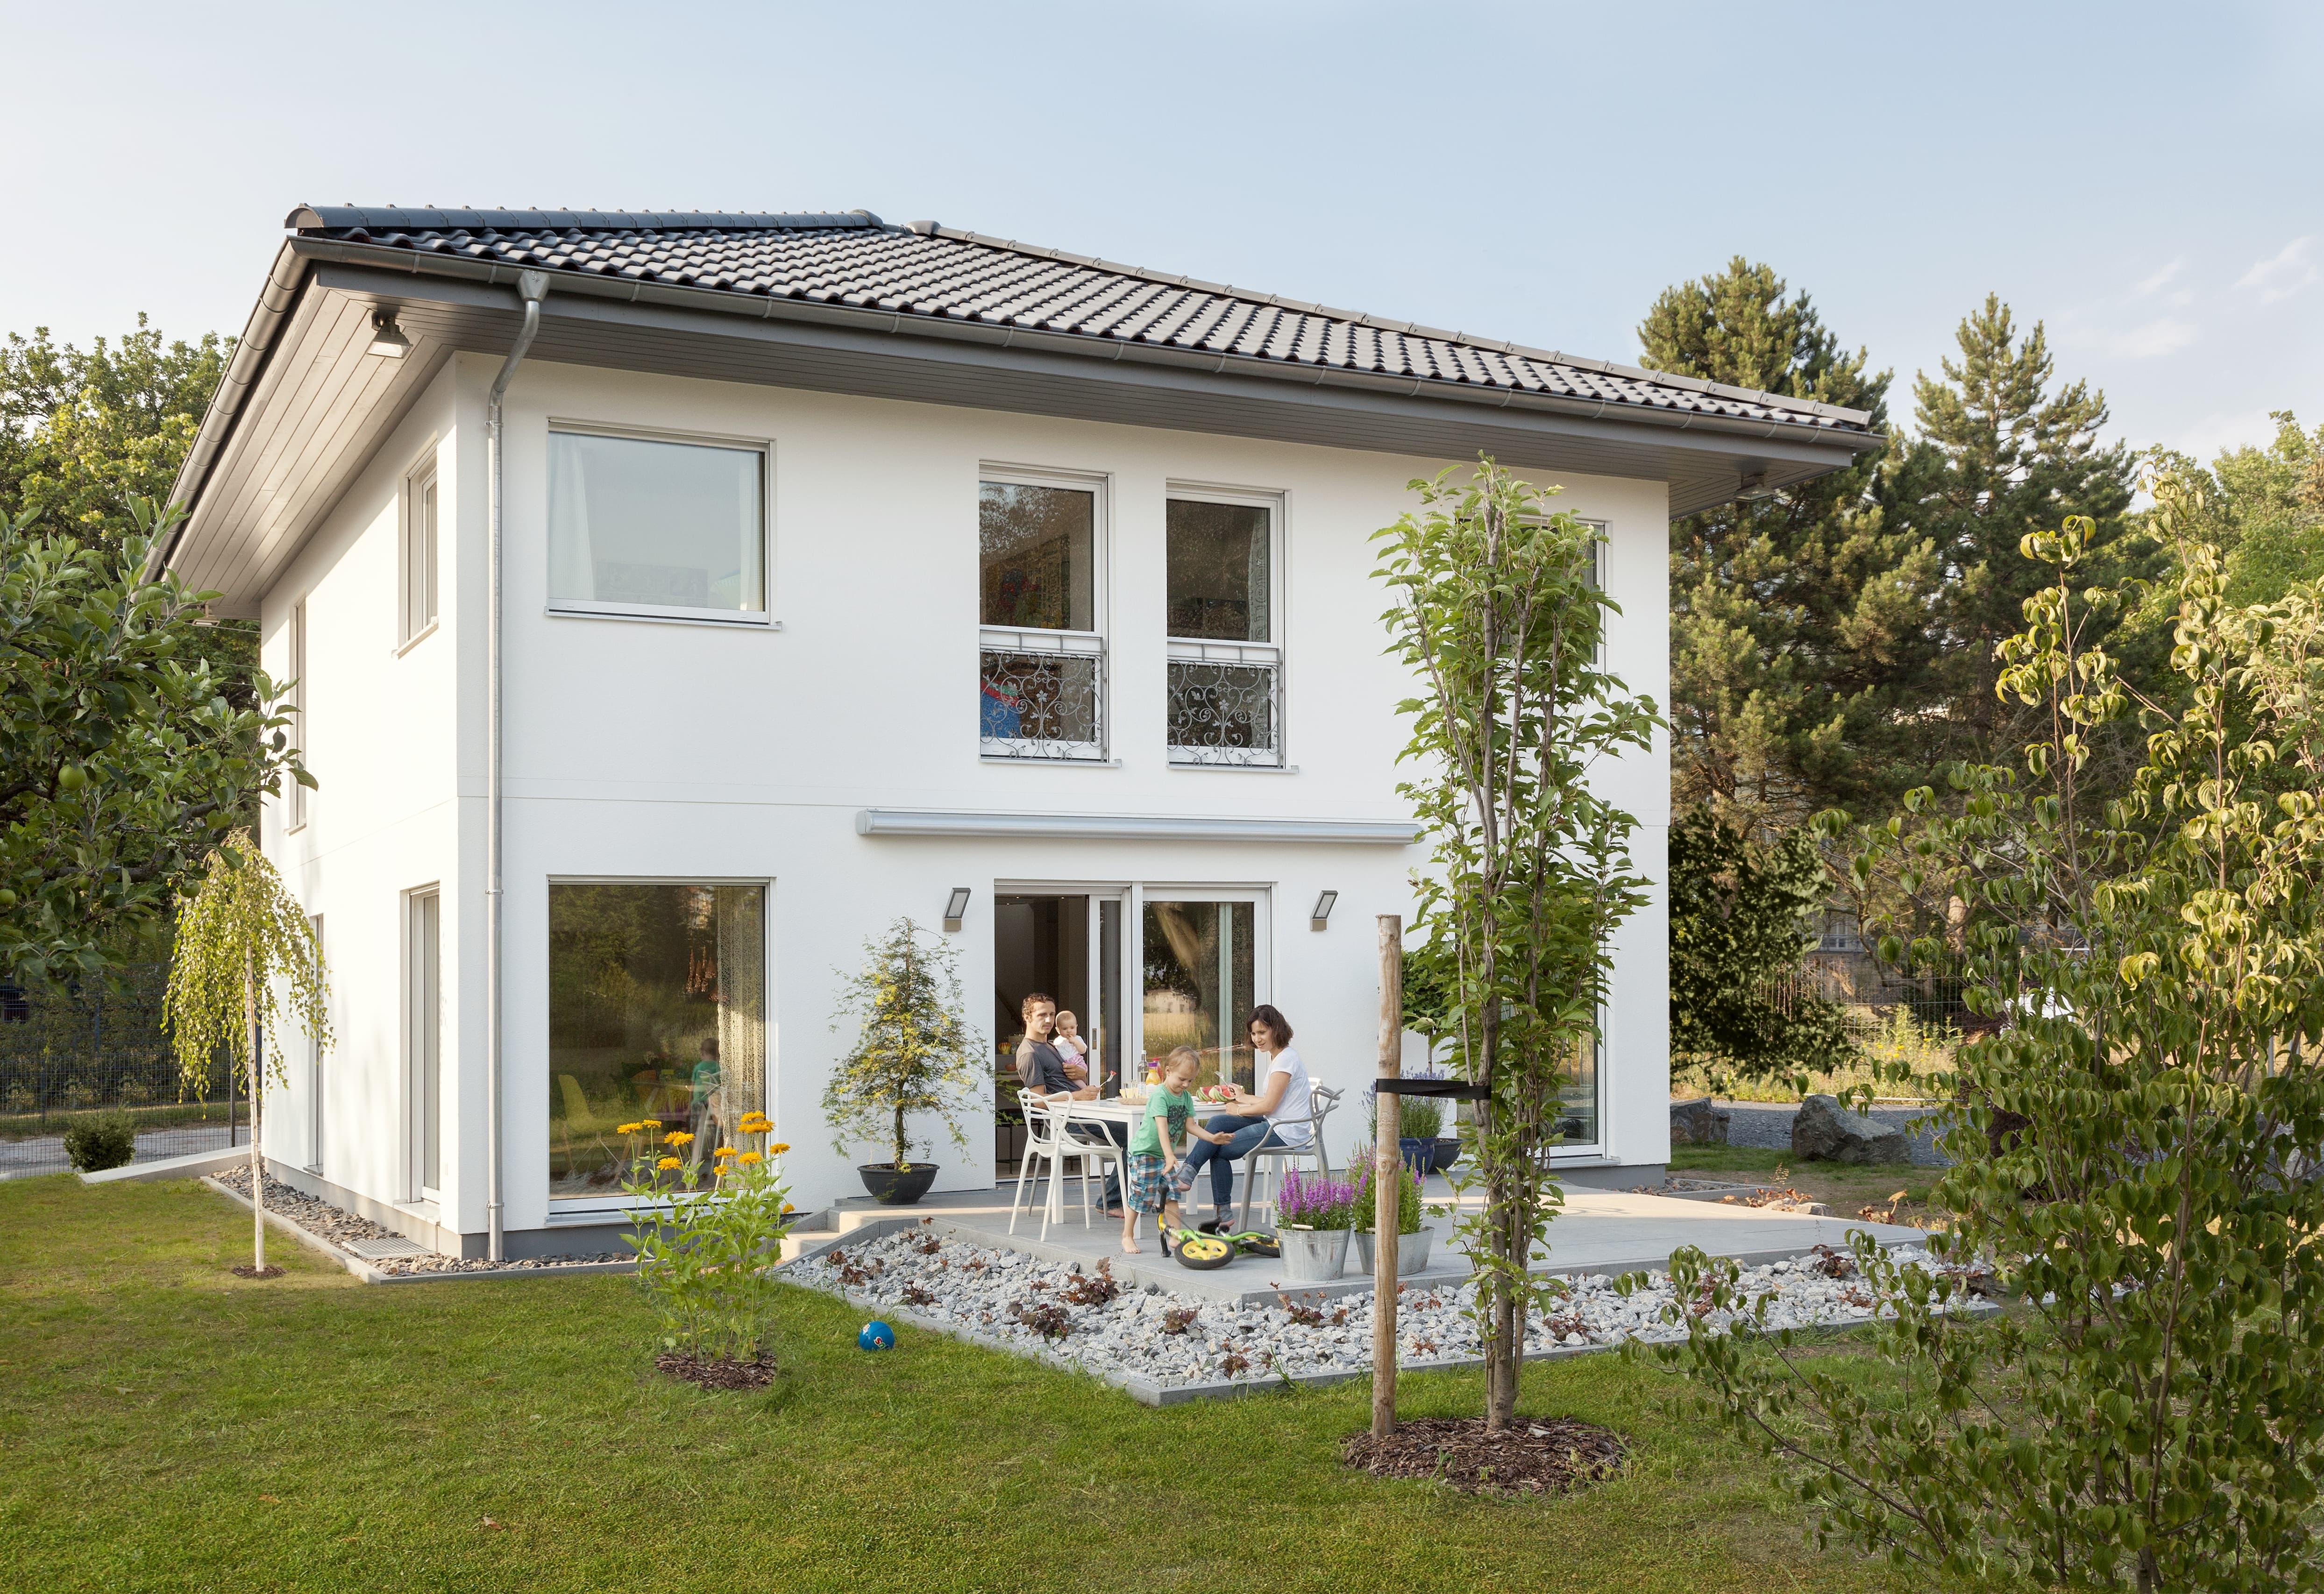 schw rerhaus modernes stadthaus. Black Bedroom Furniture Sets. Home Design Ideas